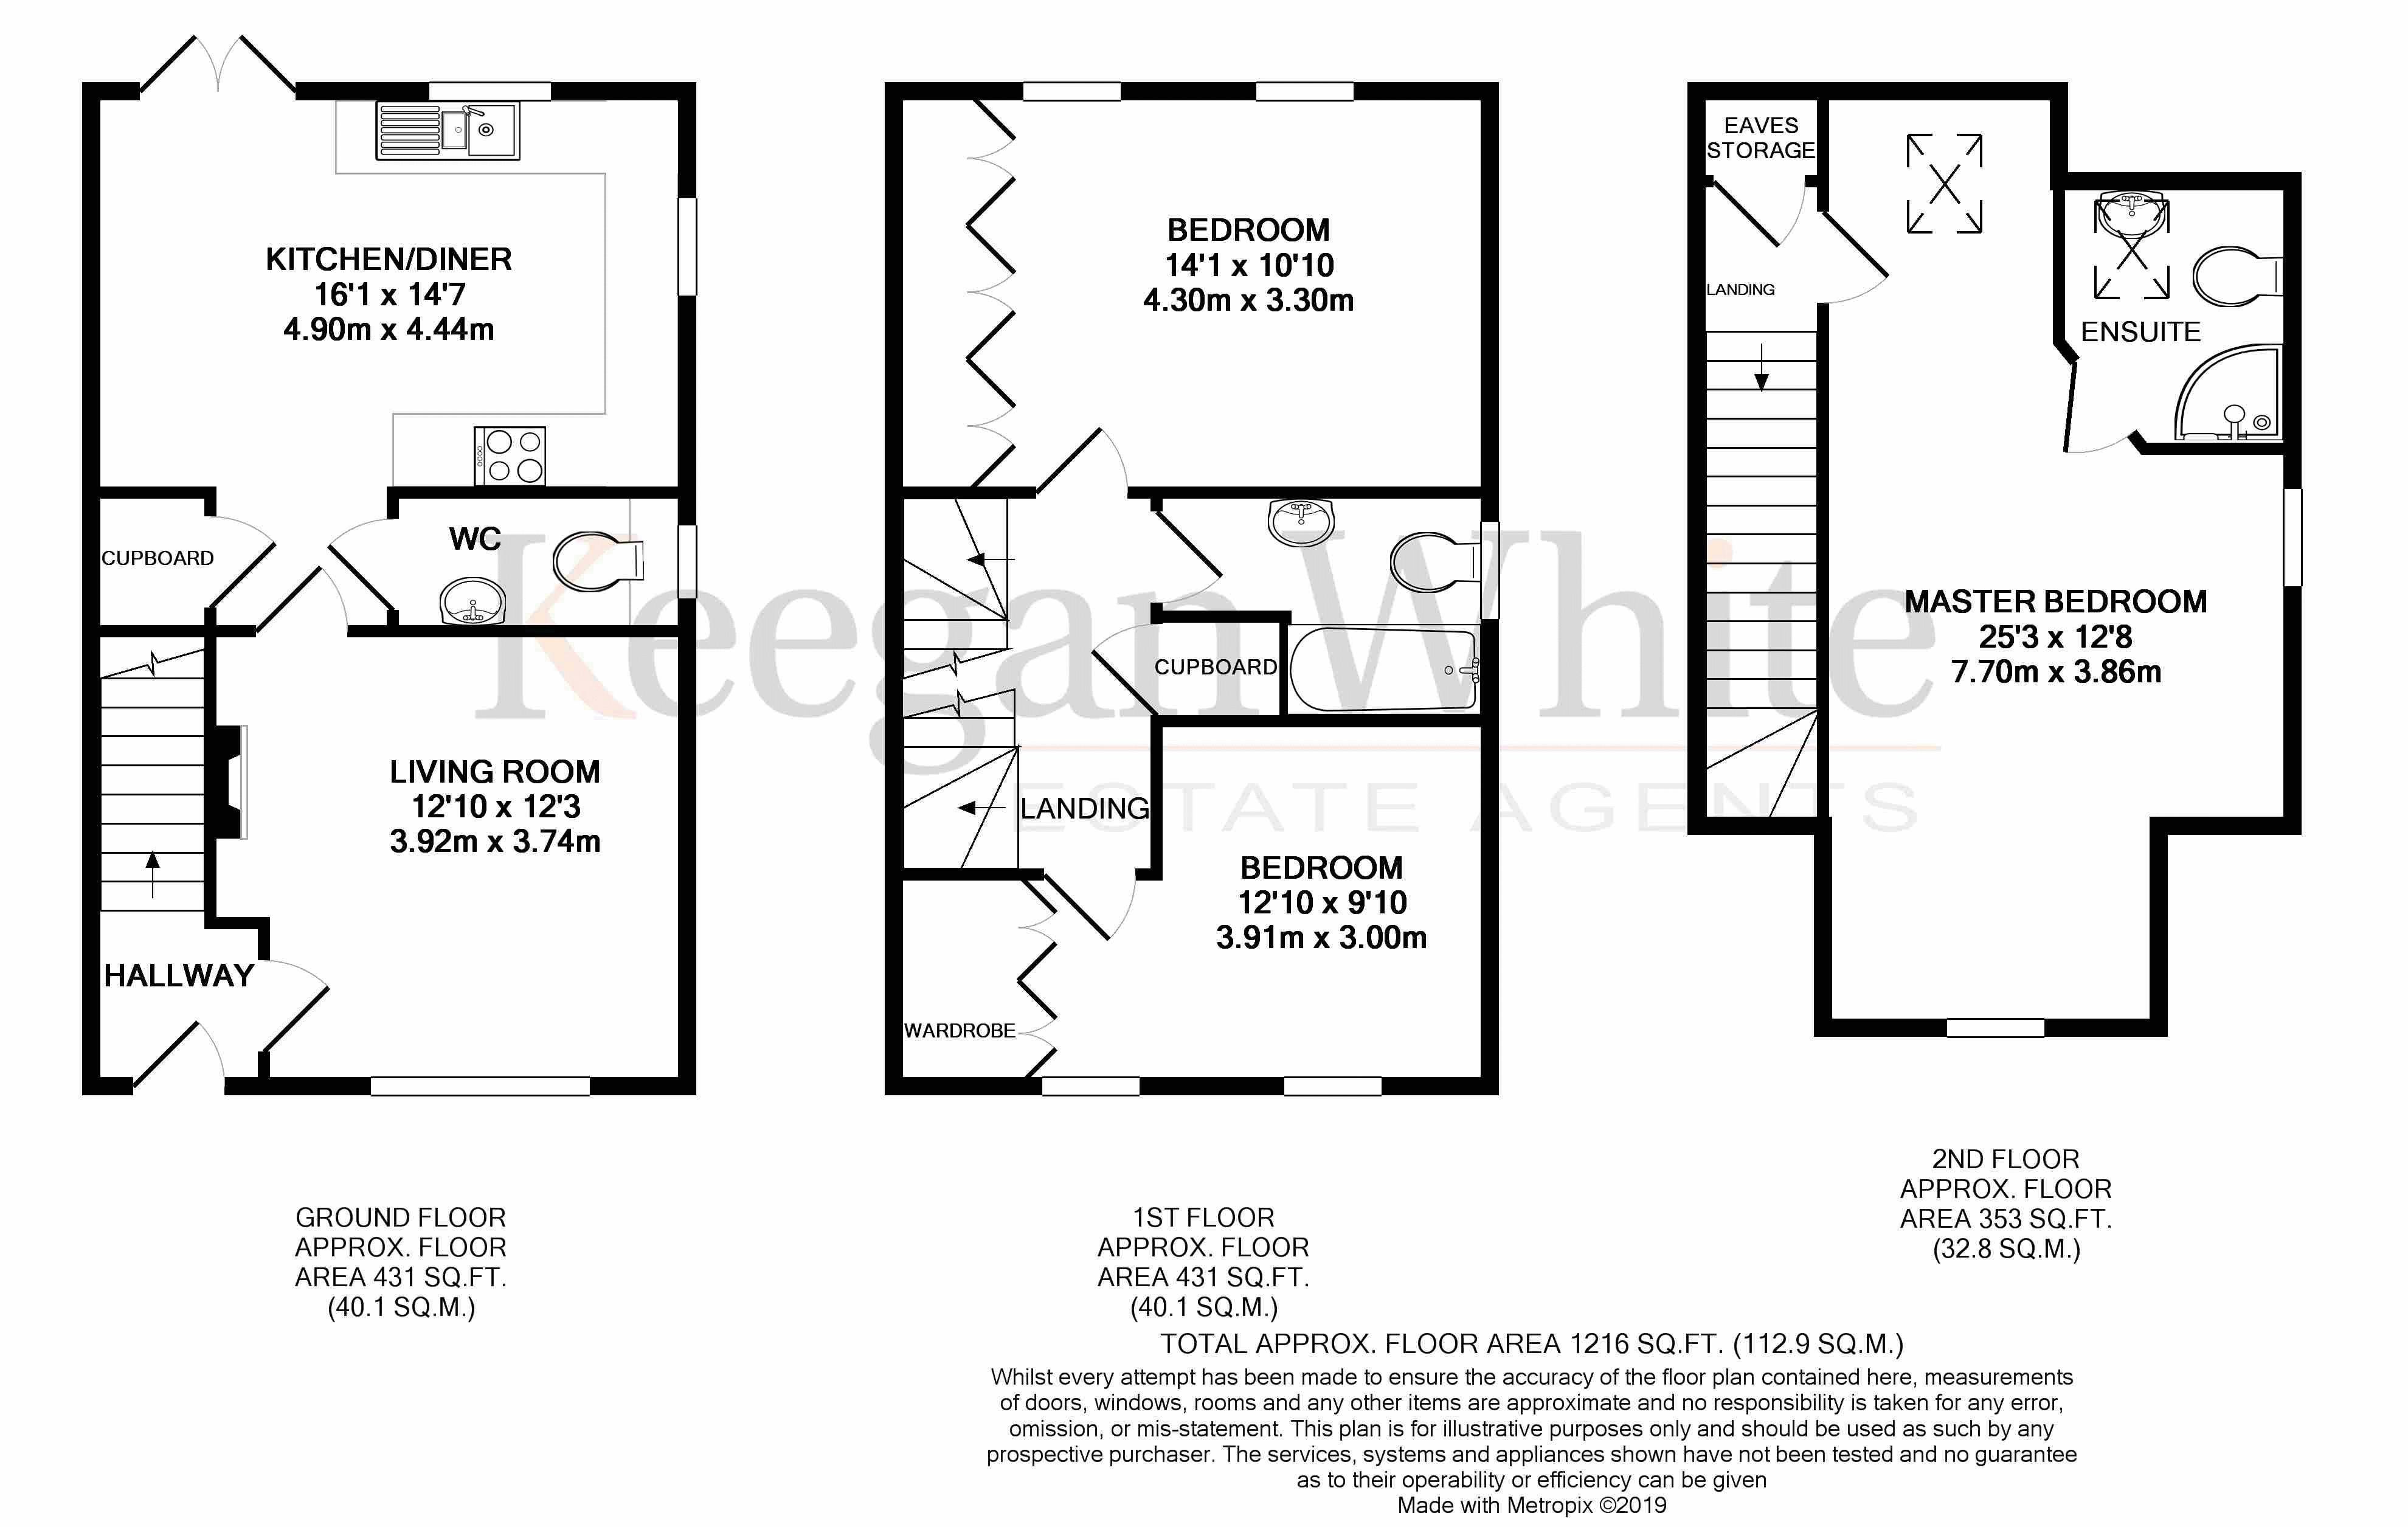 Keegan White Estate Agent in High Wycombe - Floorp